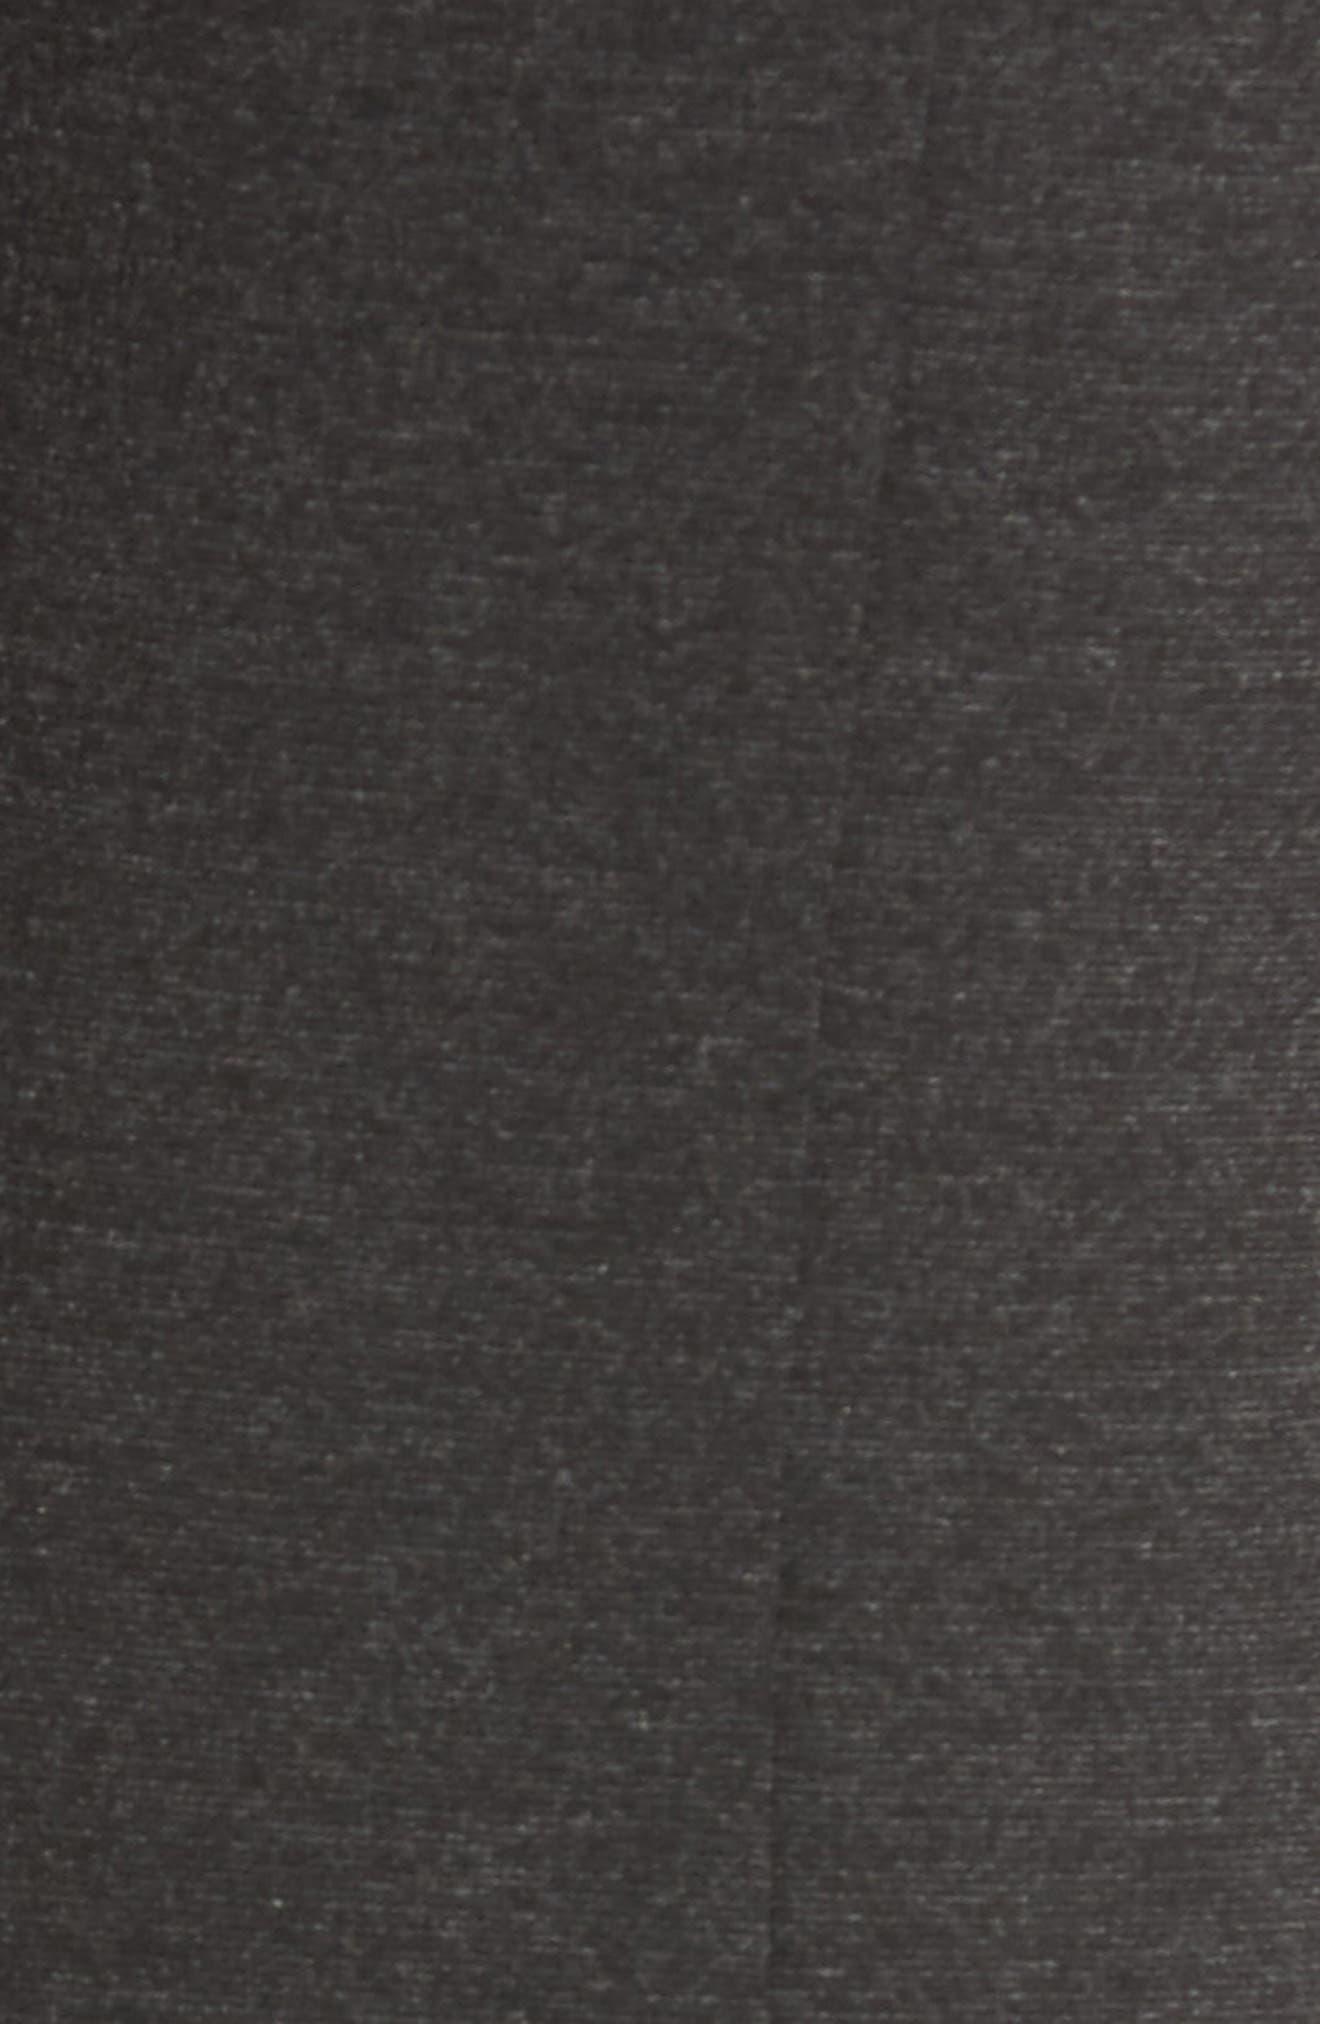 Seamed Ponte Knit Leggings,                             Alternate thumbnail 5, color,                             Charcoal Grey